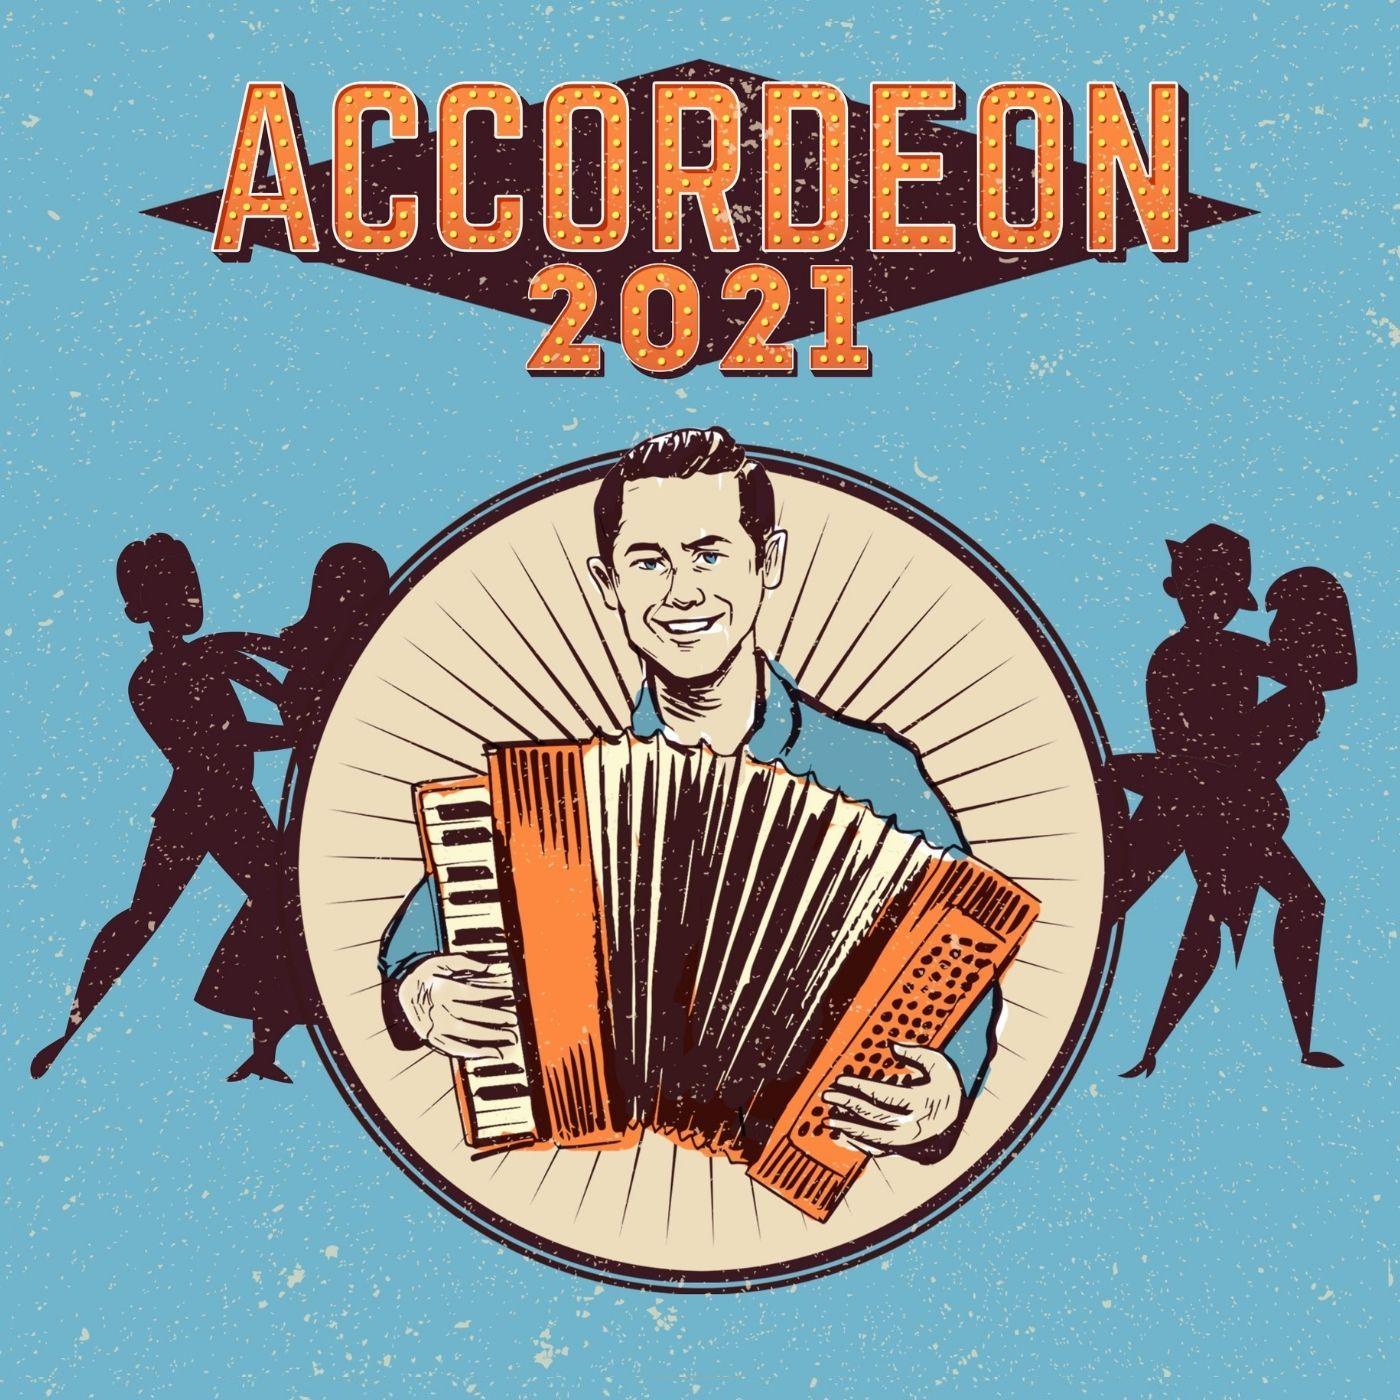 Accordéon 2021